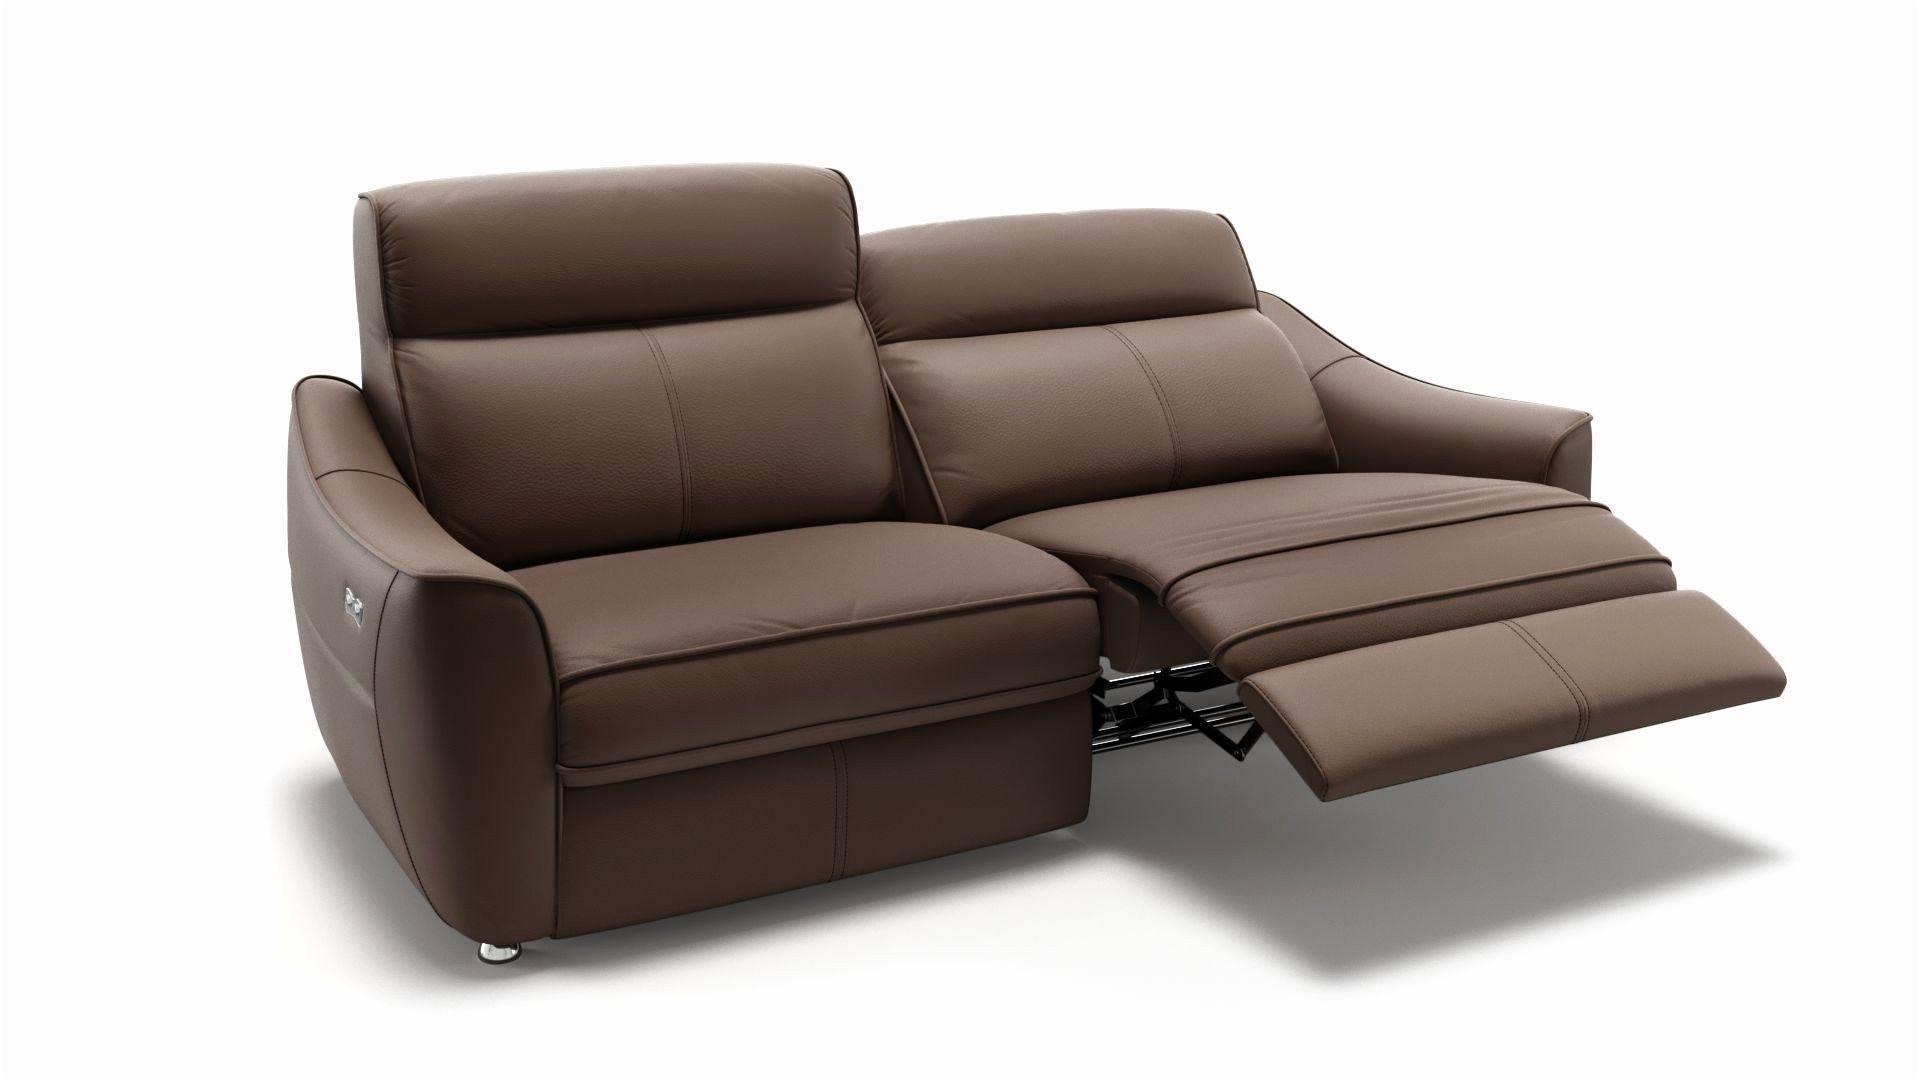 Interessant Sofa Ohne Armlehne Elegant Sofa Home Recliner Chair